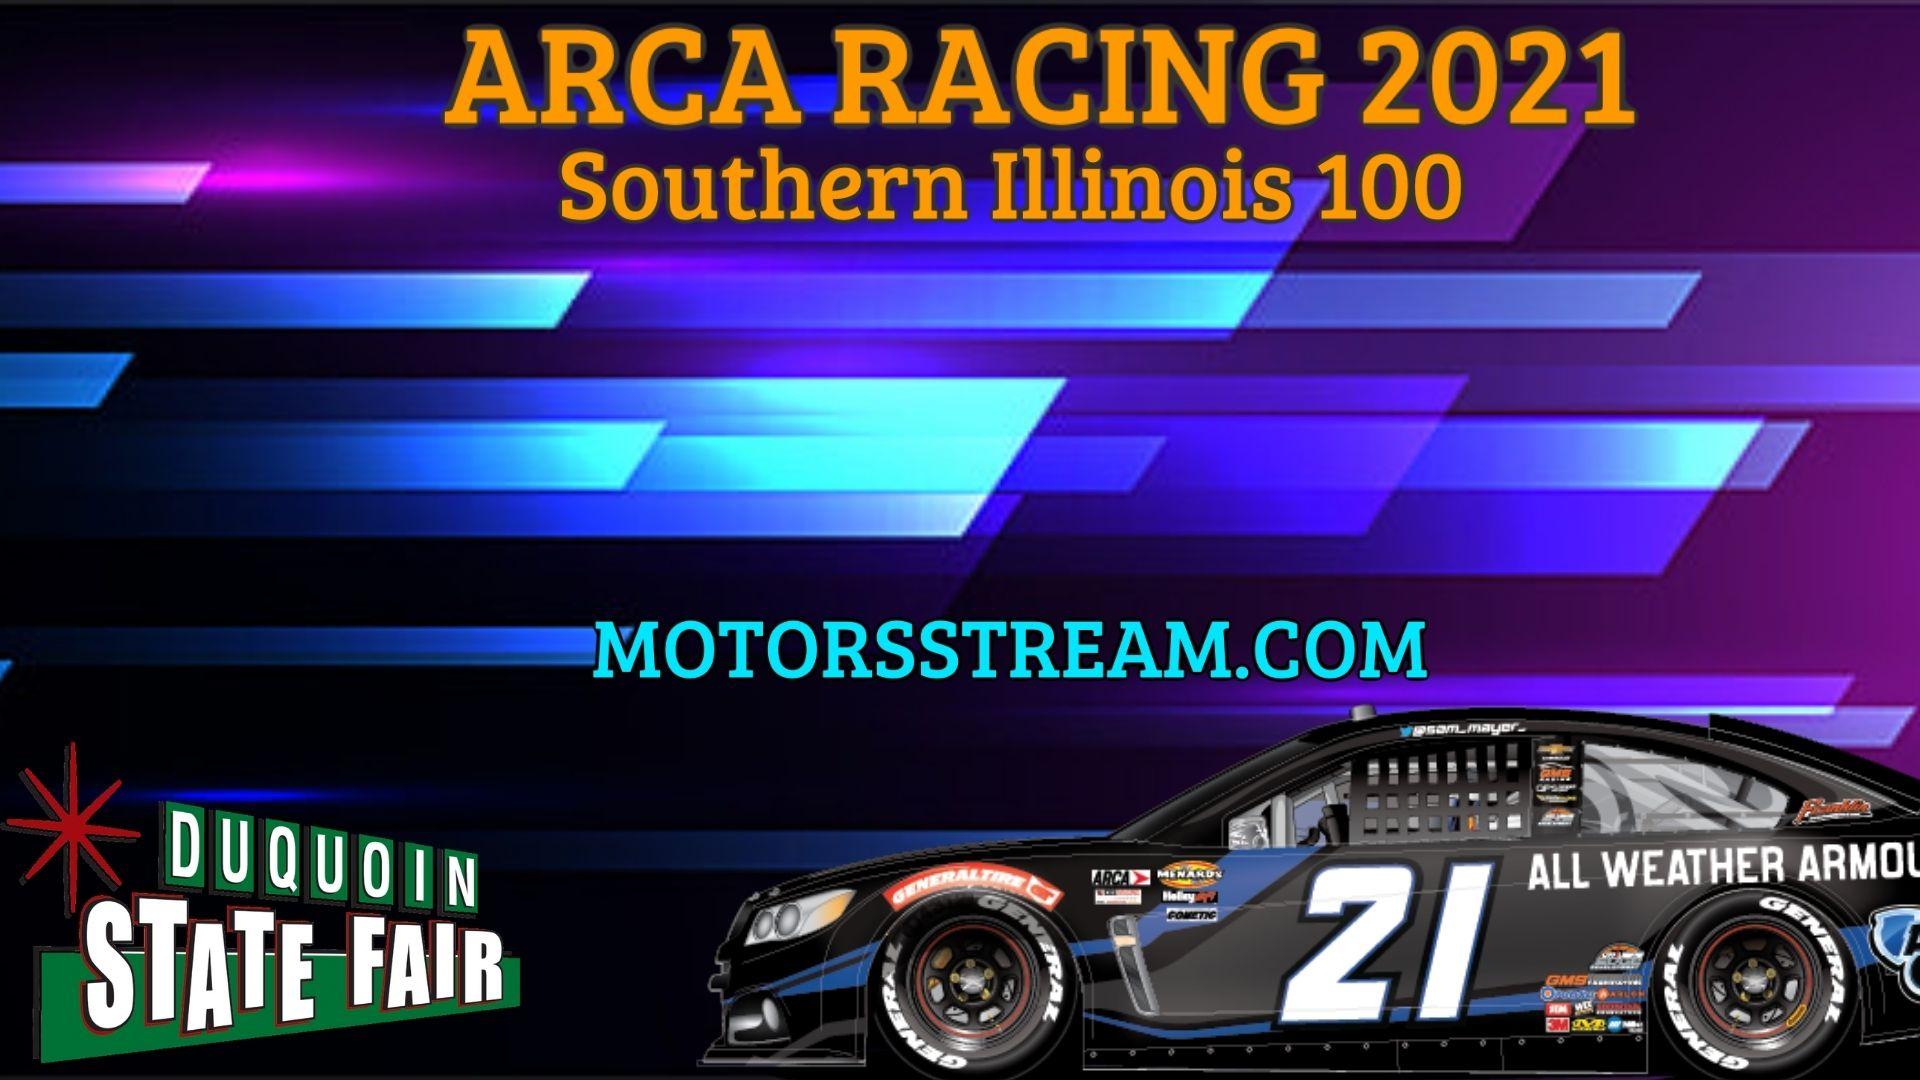 Southern Illinois 100 Live Stream 2021 Arca Racing